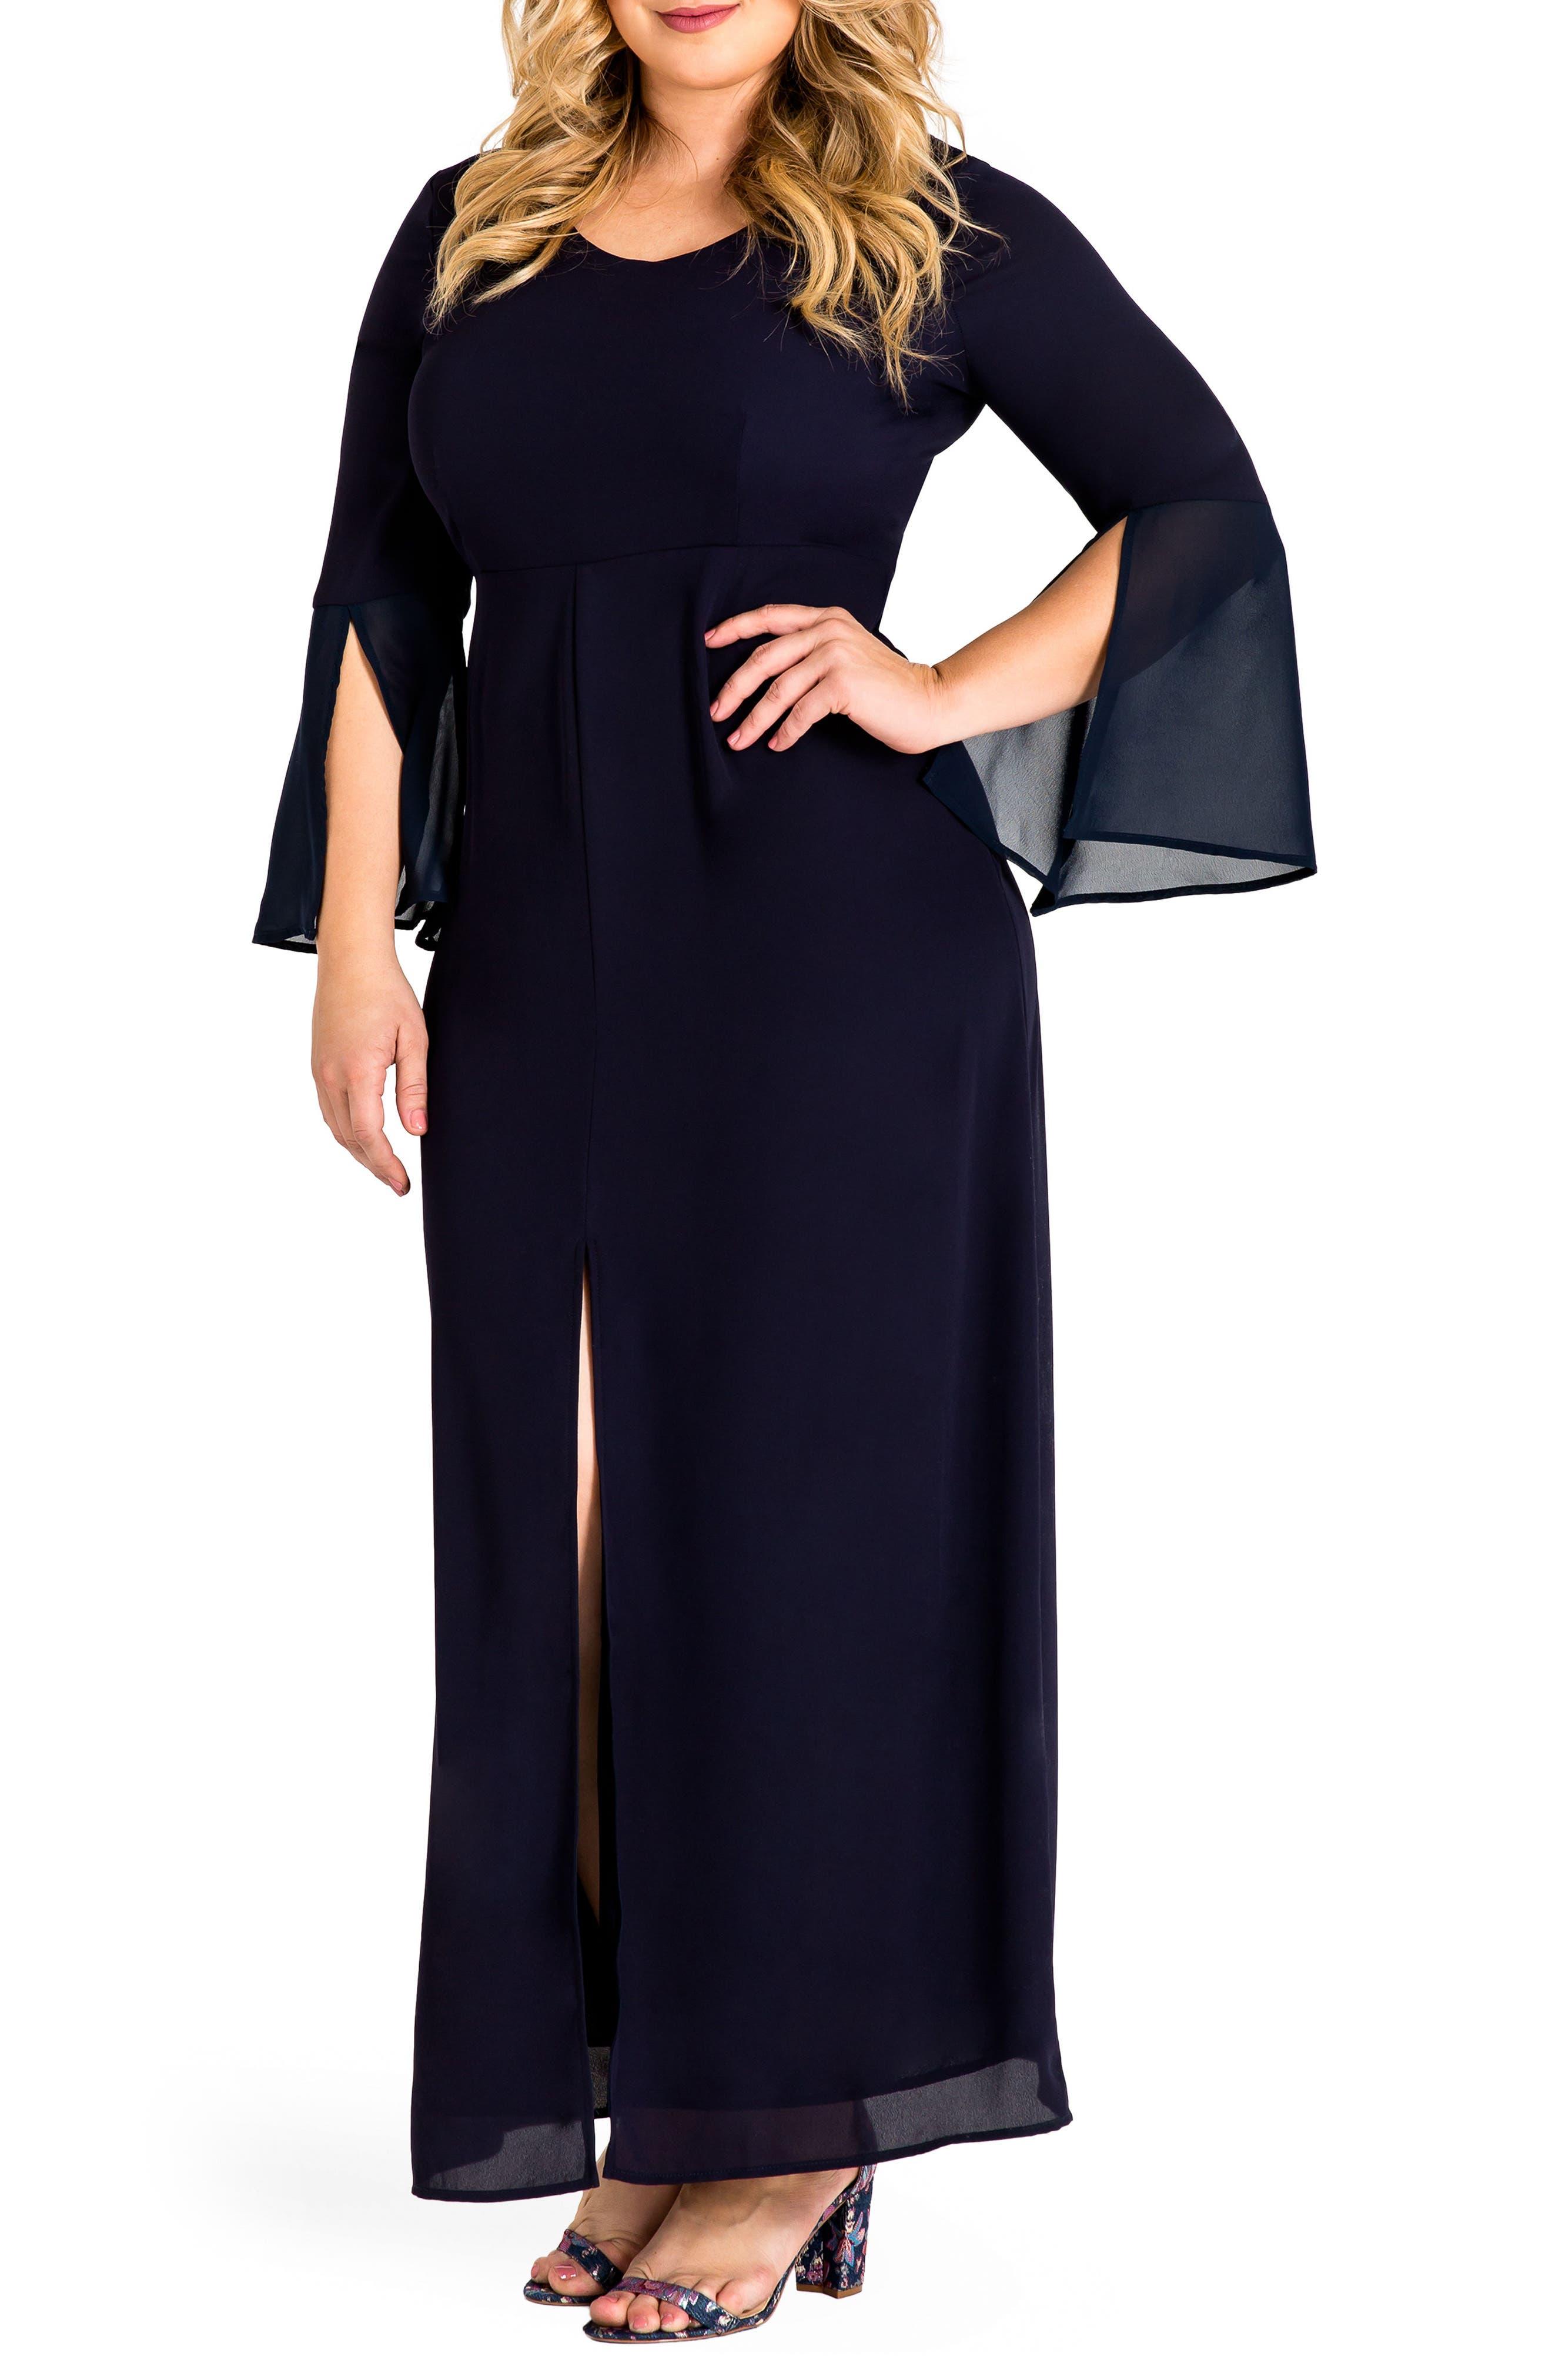 Norah Maxi Dress,                             Main thumbnail 1, color,                             Navy